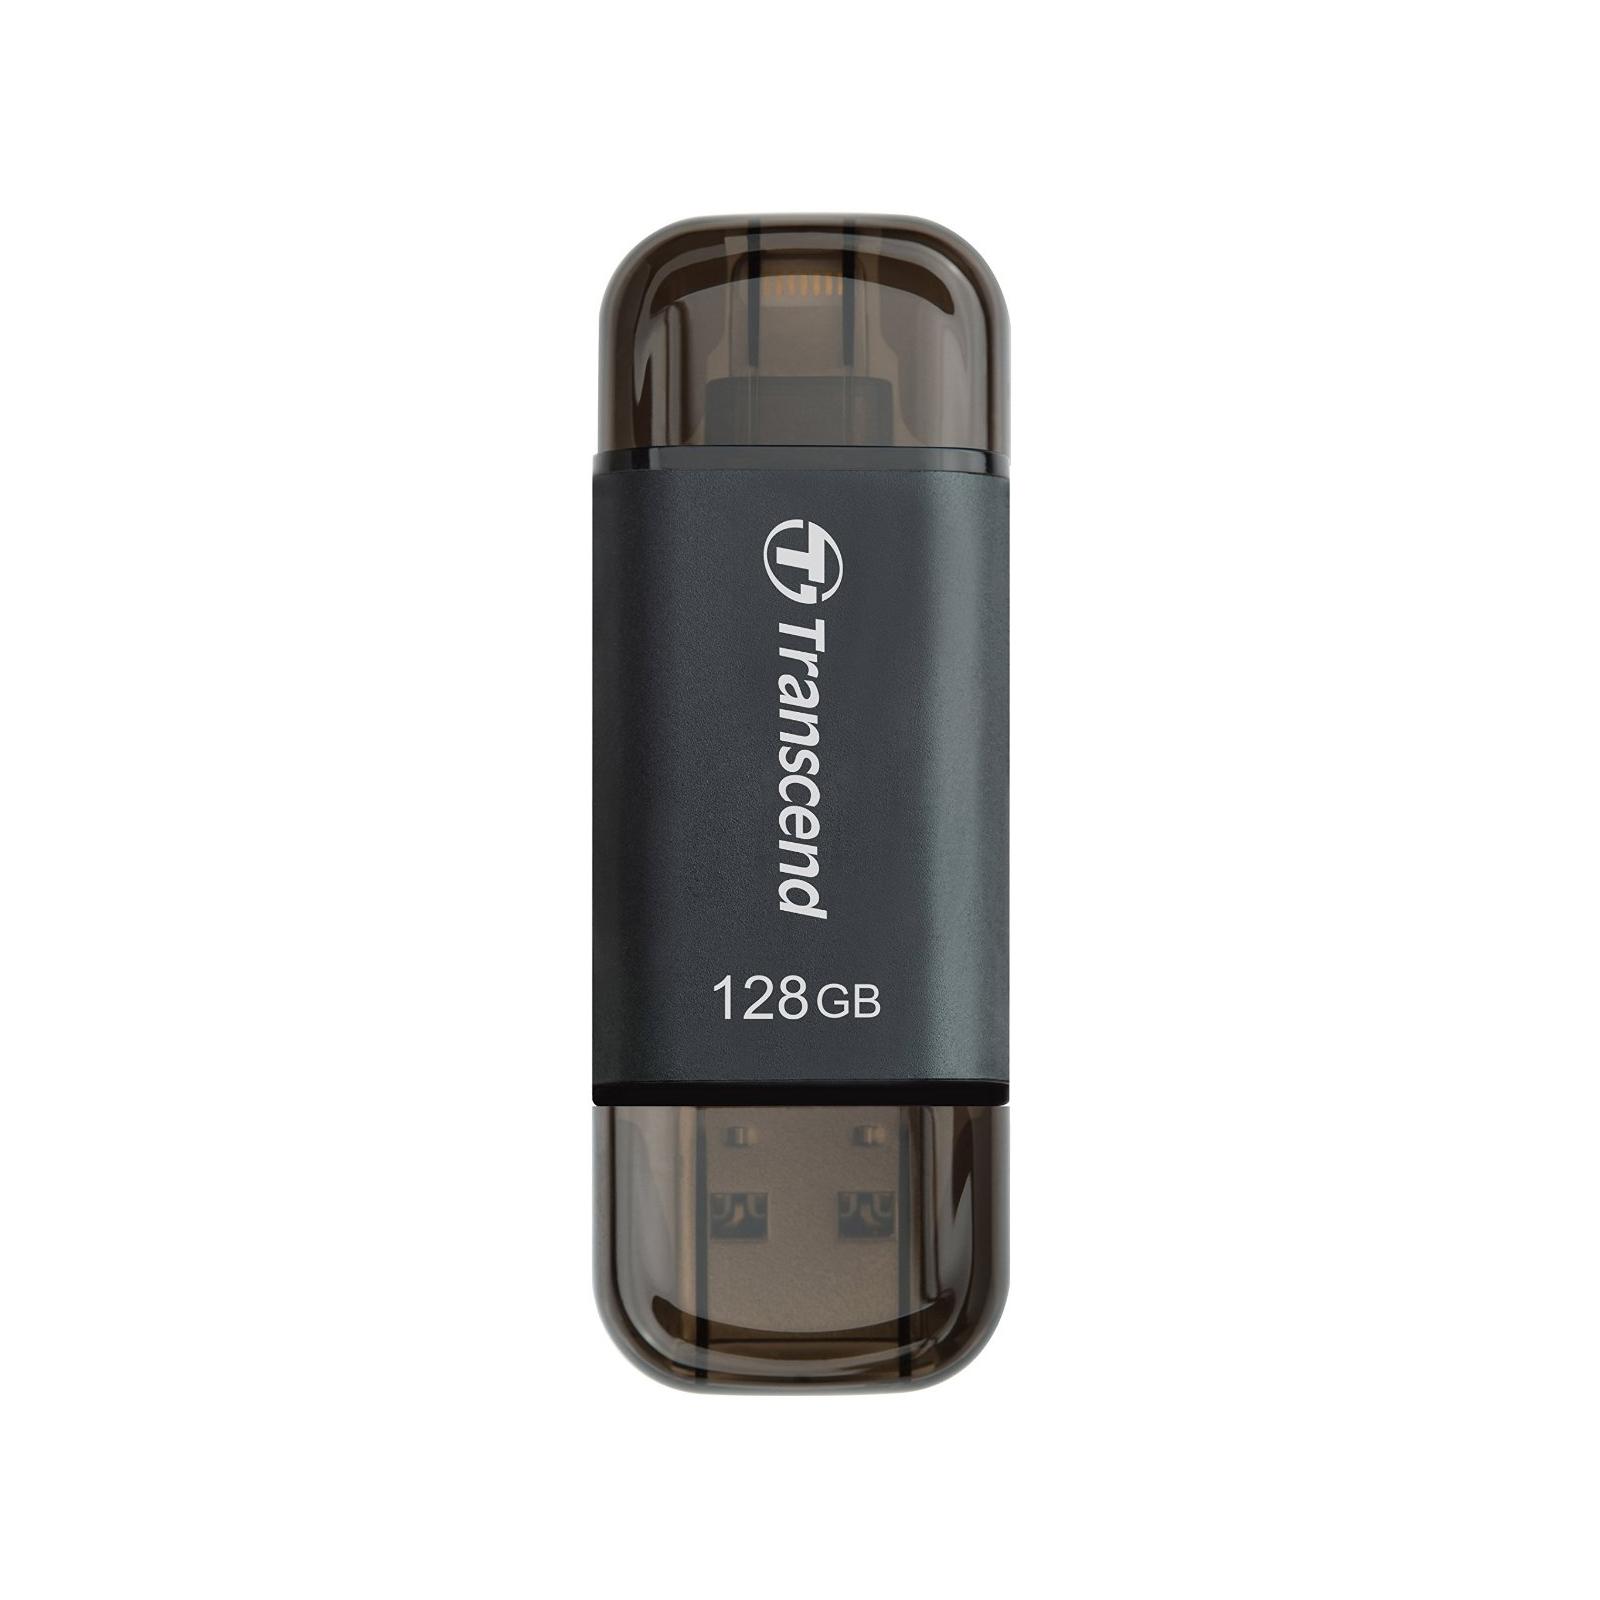 USB флеш накопитель Transcend 128GB JetDrive Go 300 USB 3.1 (TS128GJDG300K)